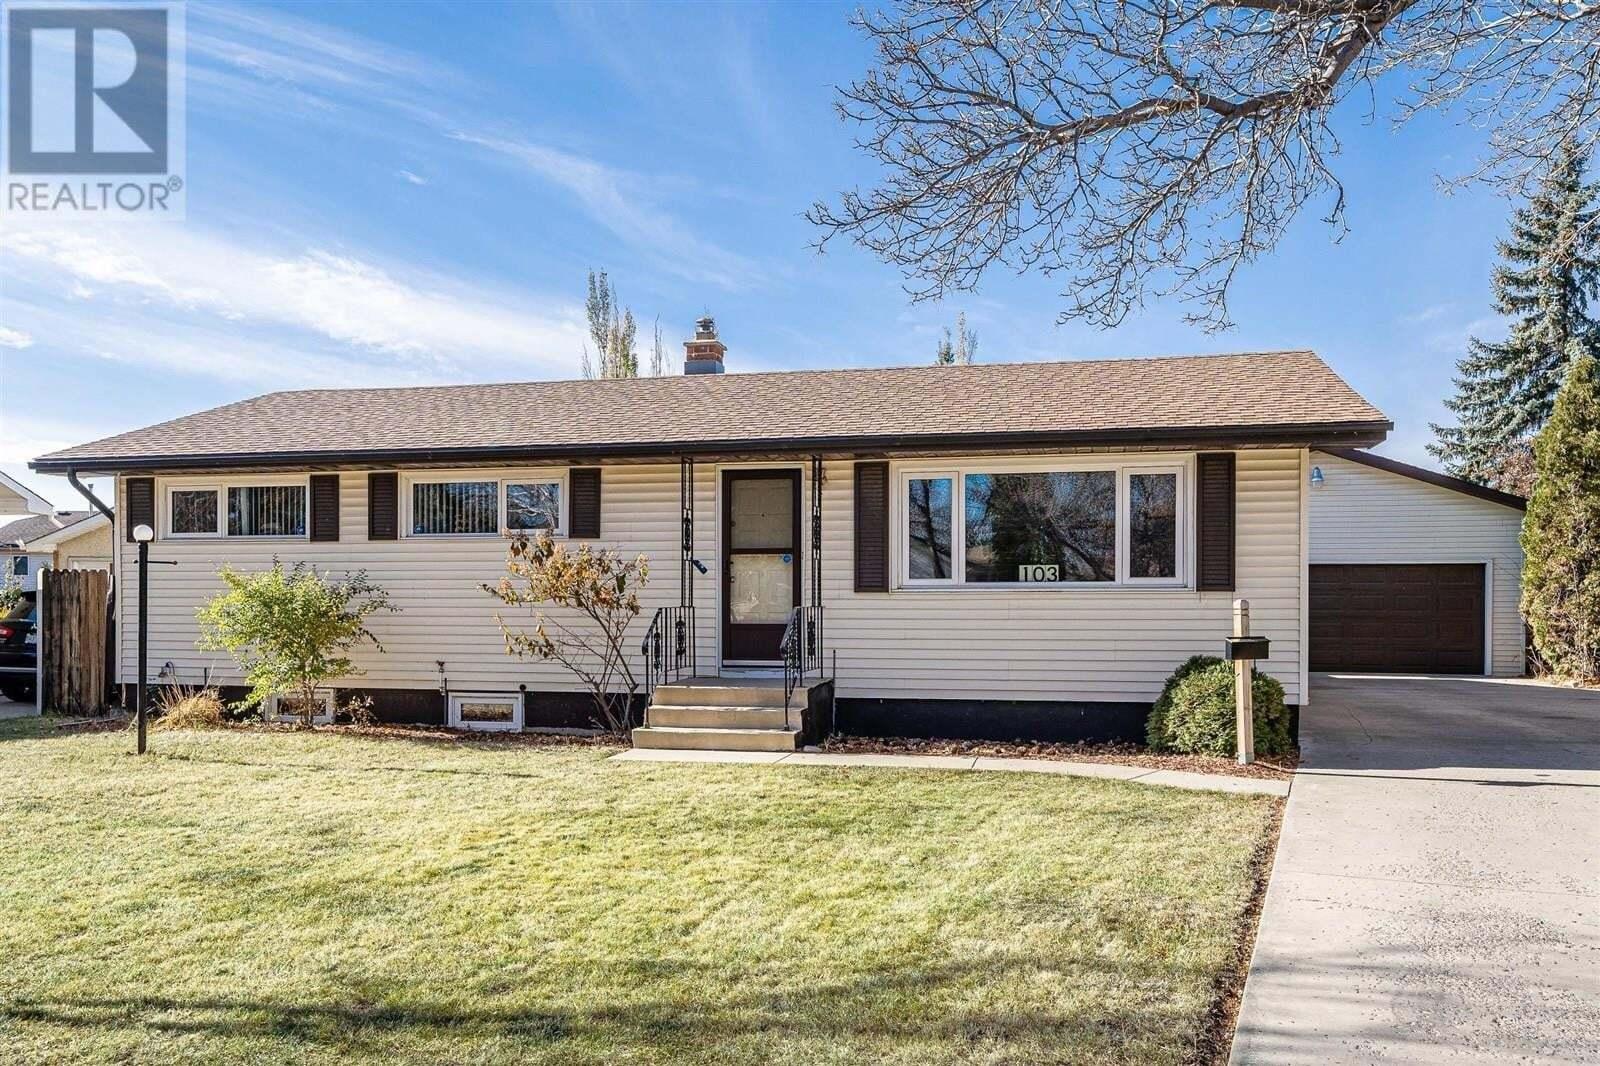 House for sale at 103 Selkirk Cres Saskatoon Saskatchewan - MLS: SK830778